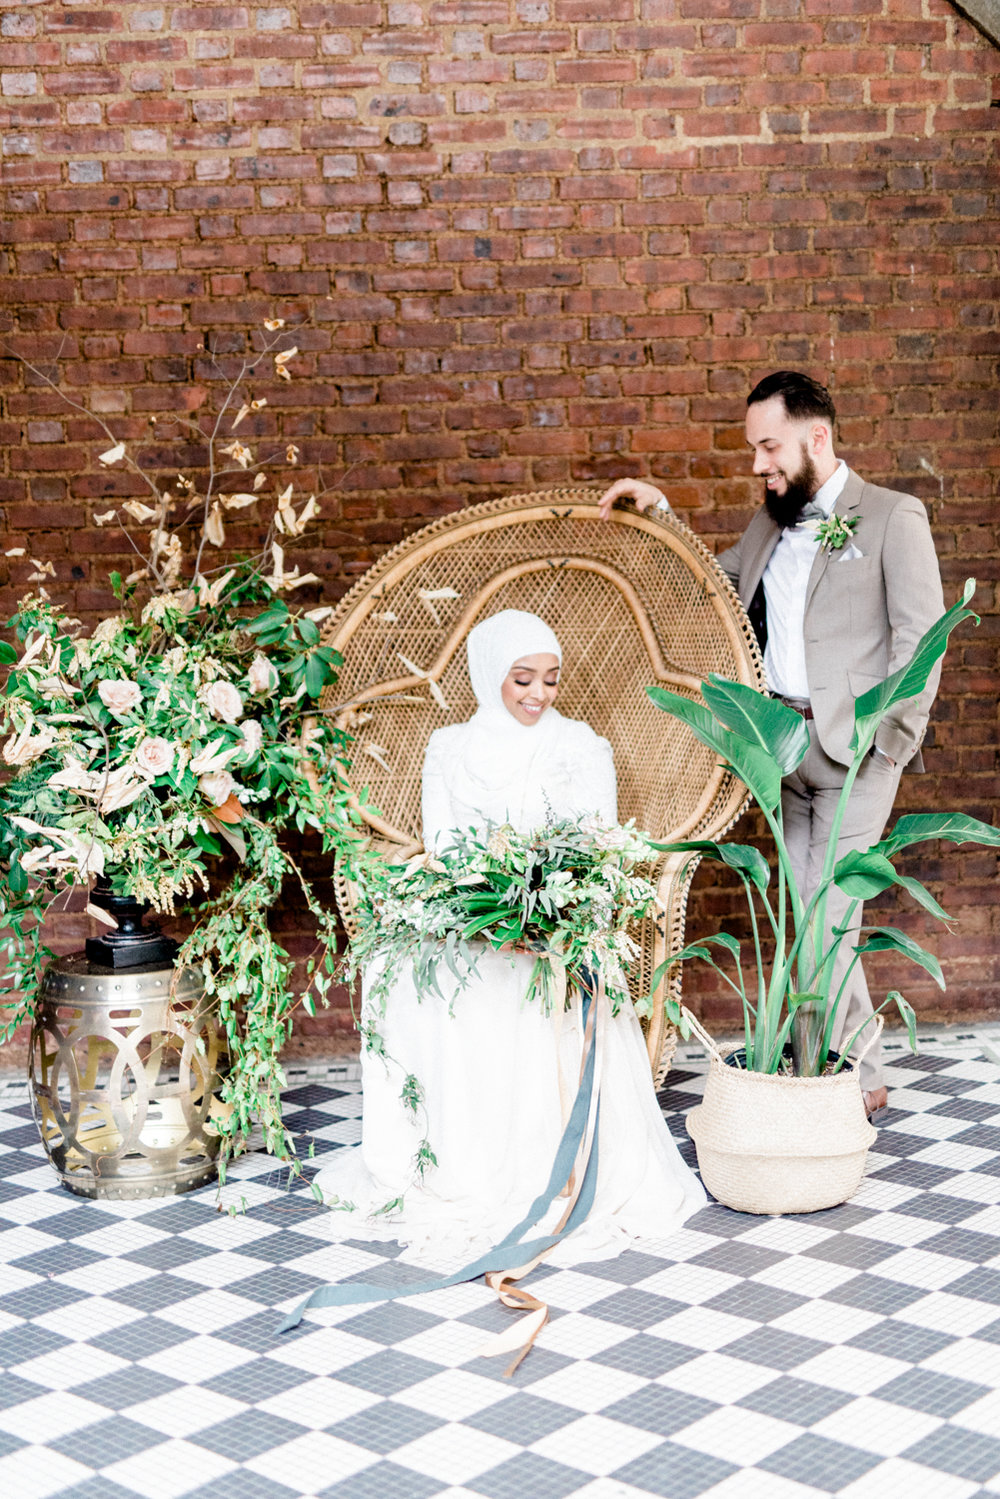 haley-richter-photography-hotel-du-village-wedding-new-hope-pa-muslim-49.jpg